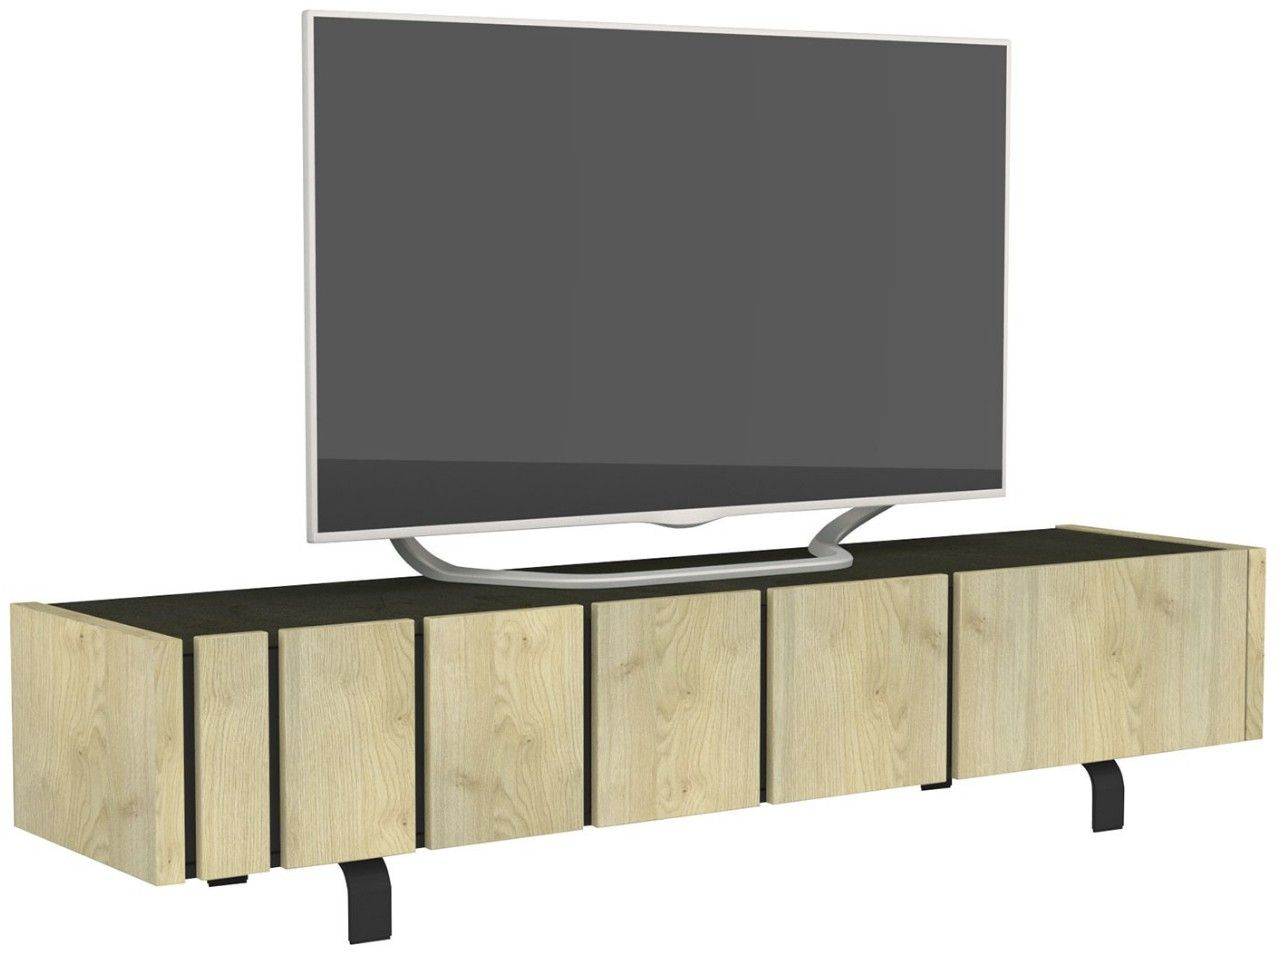 Meuble Tv 1 Porte 1 Tiroir Beton Cire Et Bois Clair Rosie 190 Collection De Meubles Mobilier De Salon Et Meuble